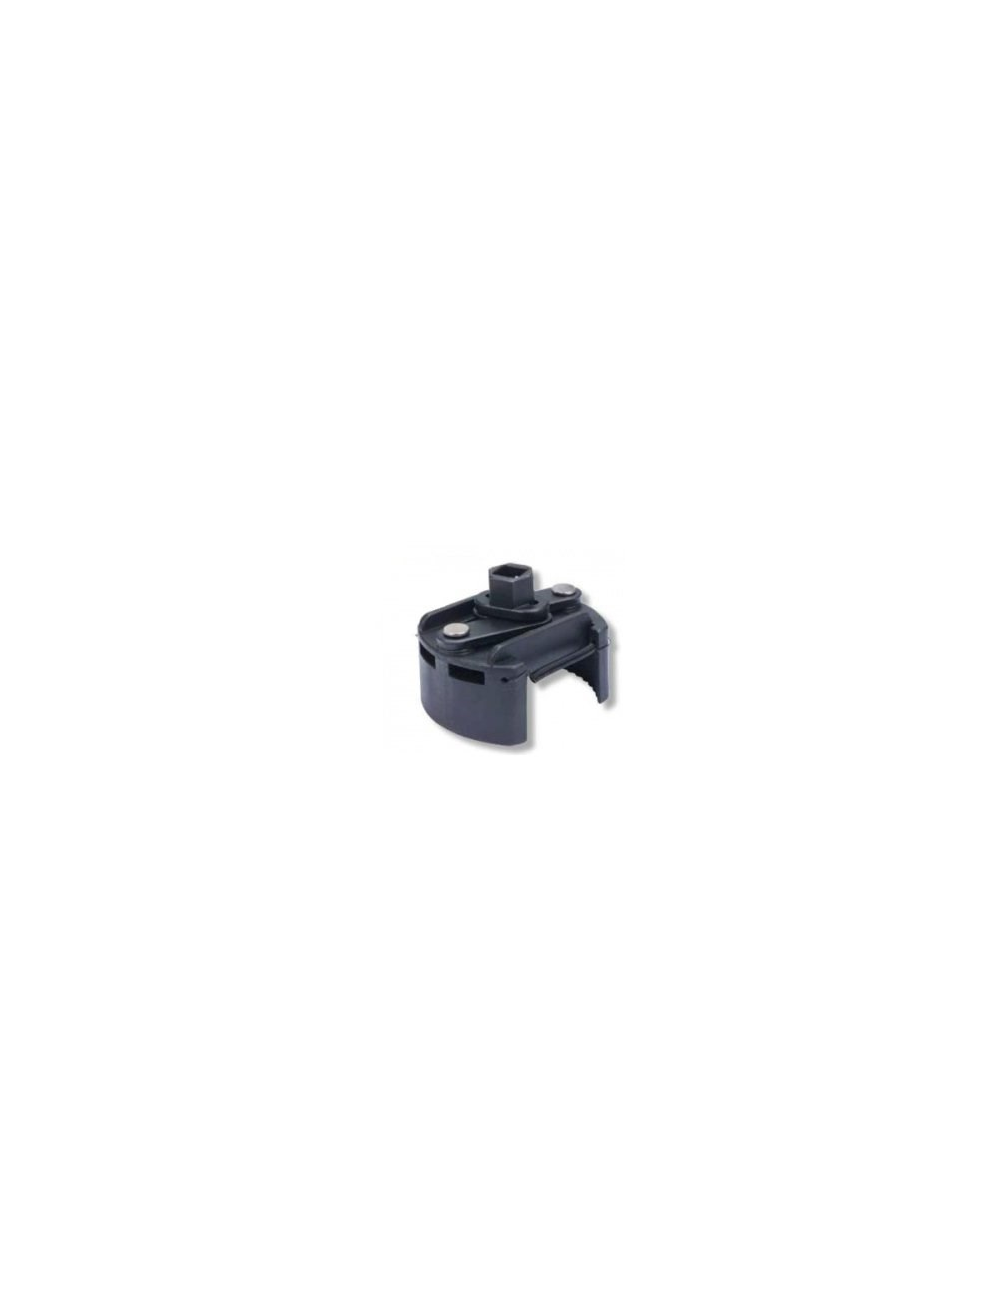 cl universelle pour filtre a huile 60 80mm. Black Bedroom Furniture Sets. Home Design Ideas